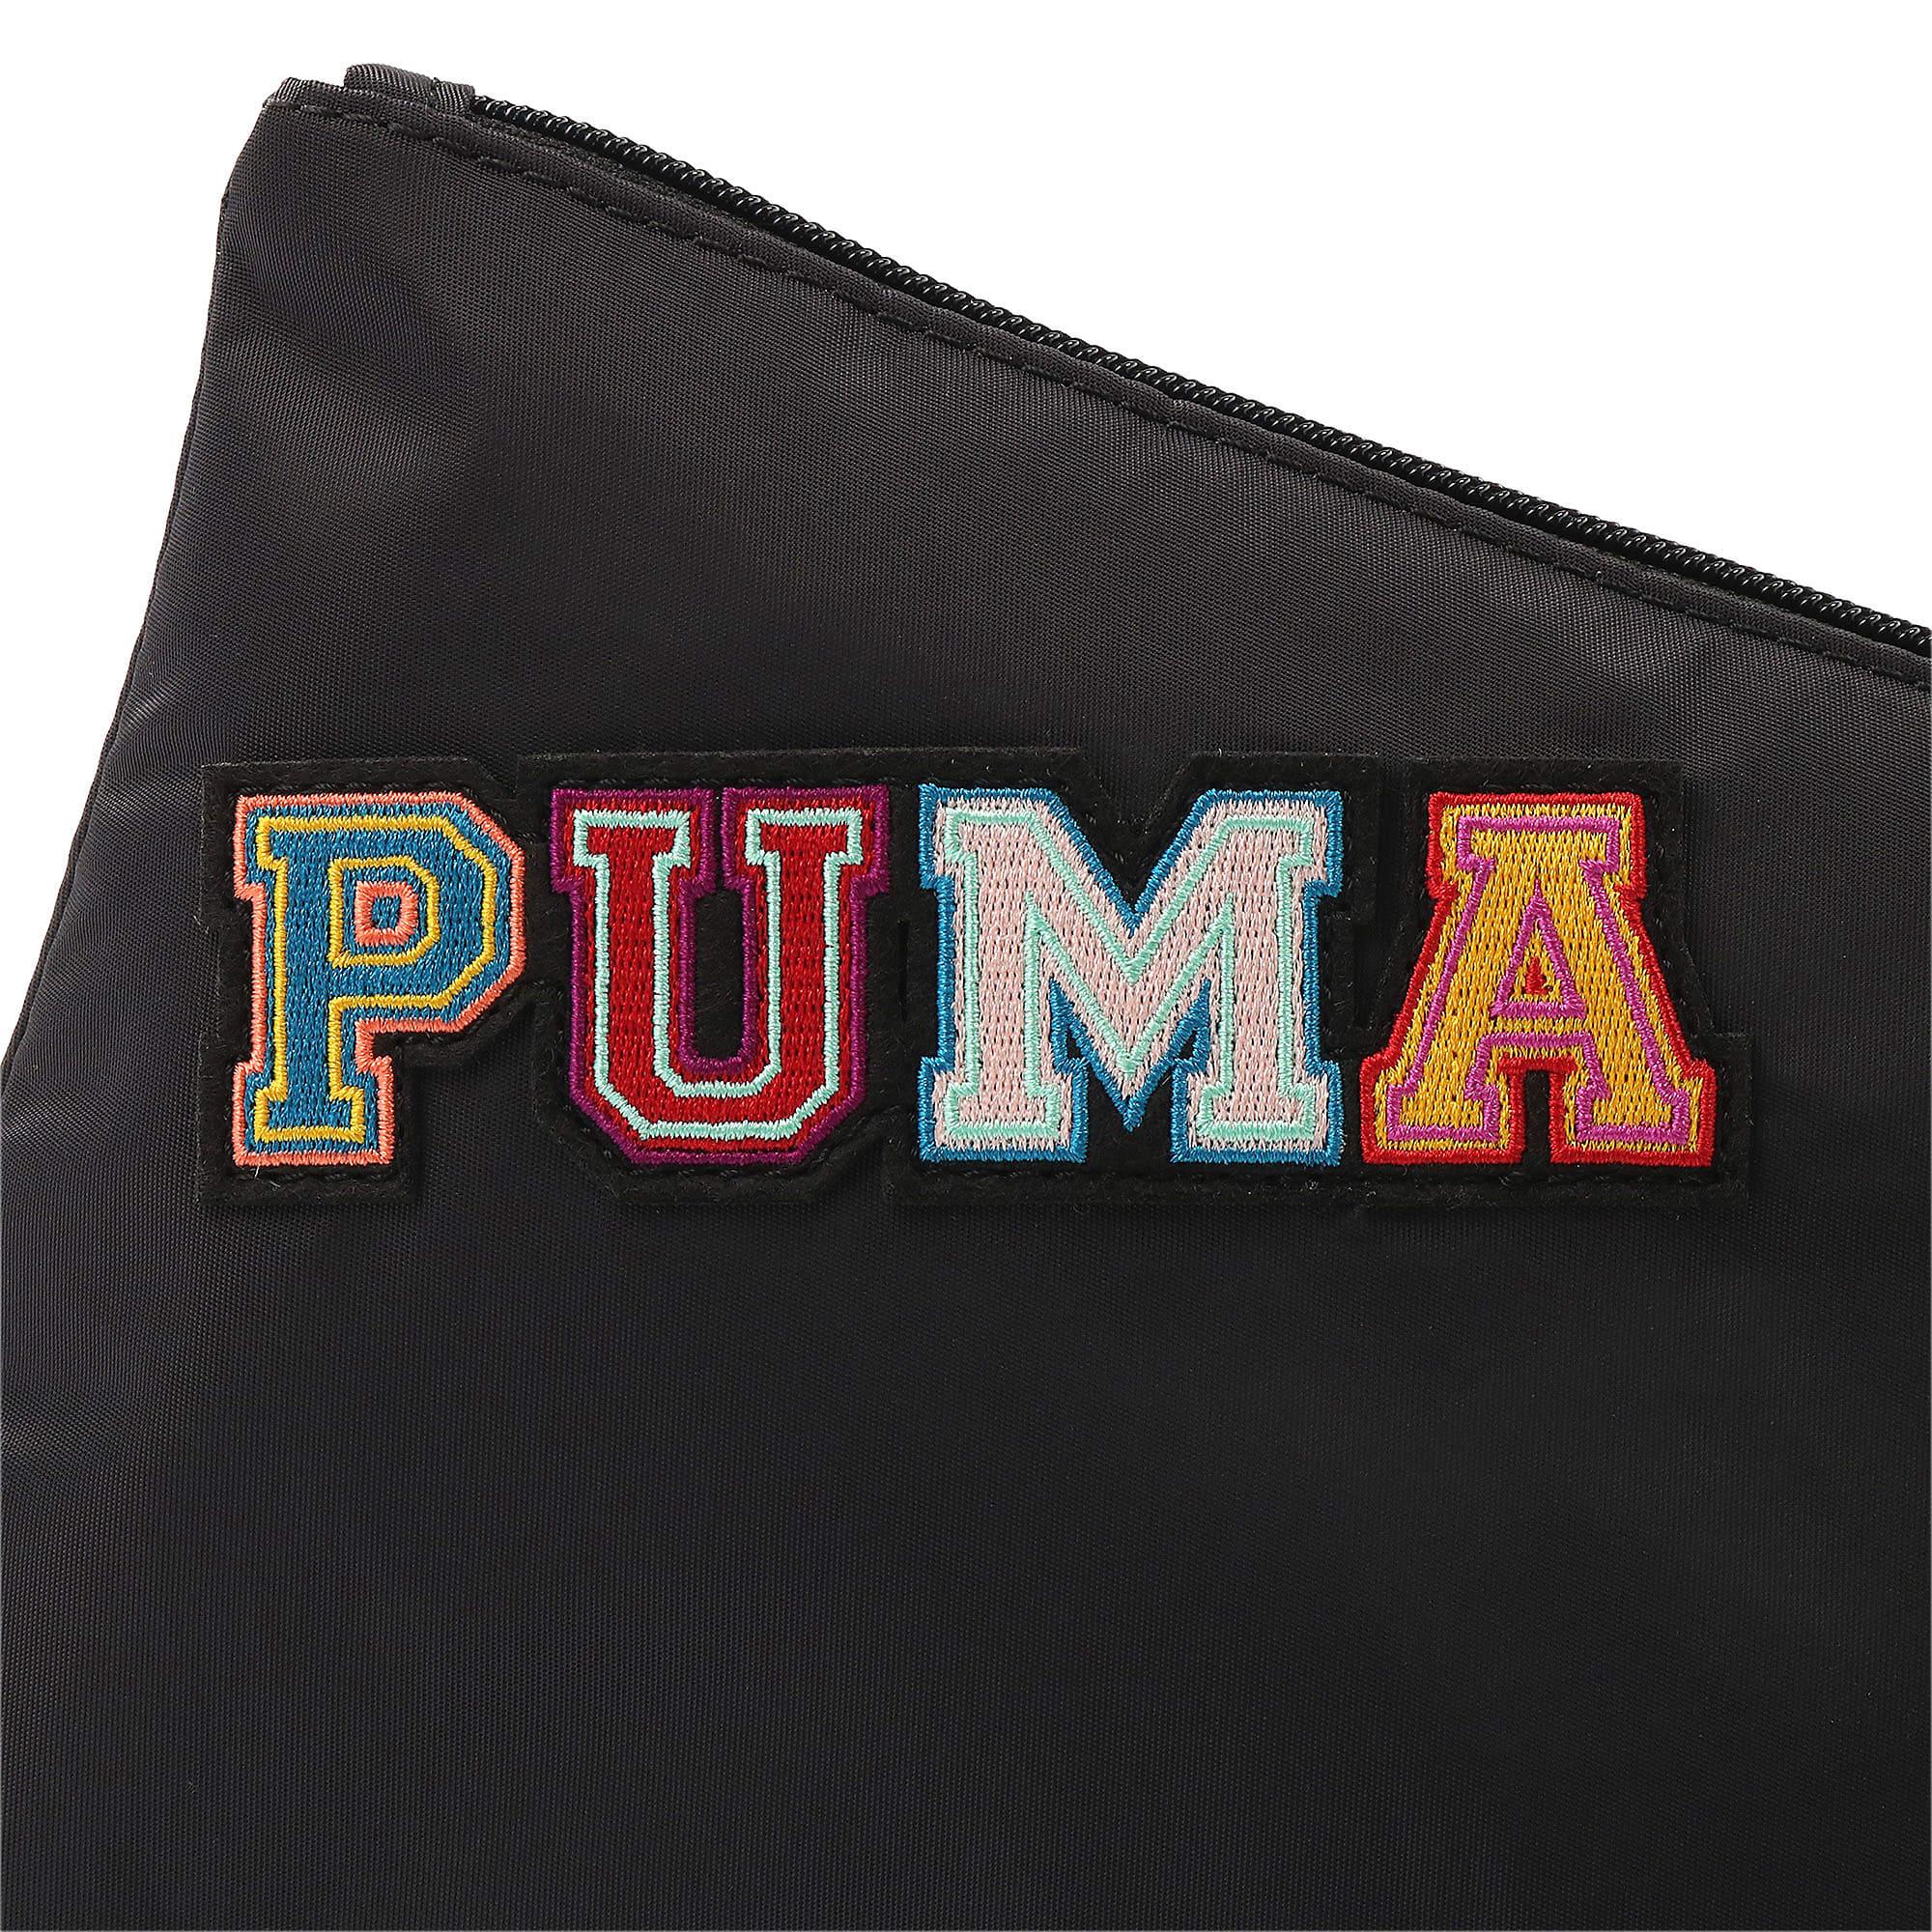 Thumbnail 4 of PUMA x SUE TSAI ウィメンズ ポーチ 1.5L, Puma Black, medium-JPN